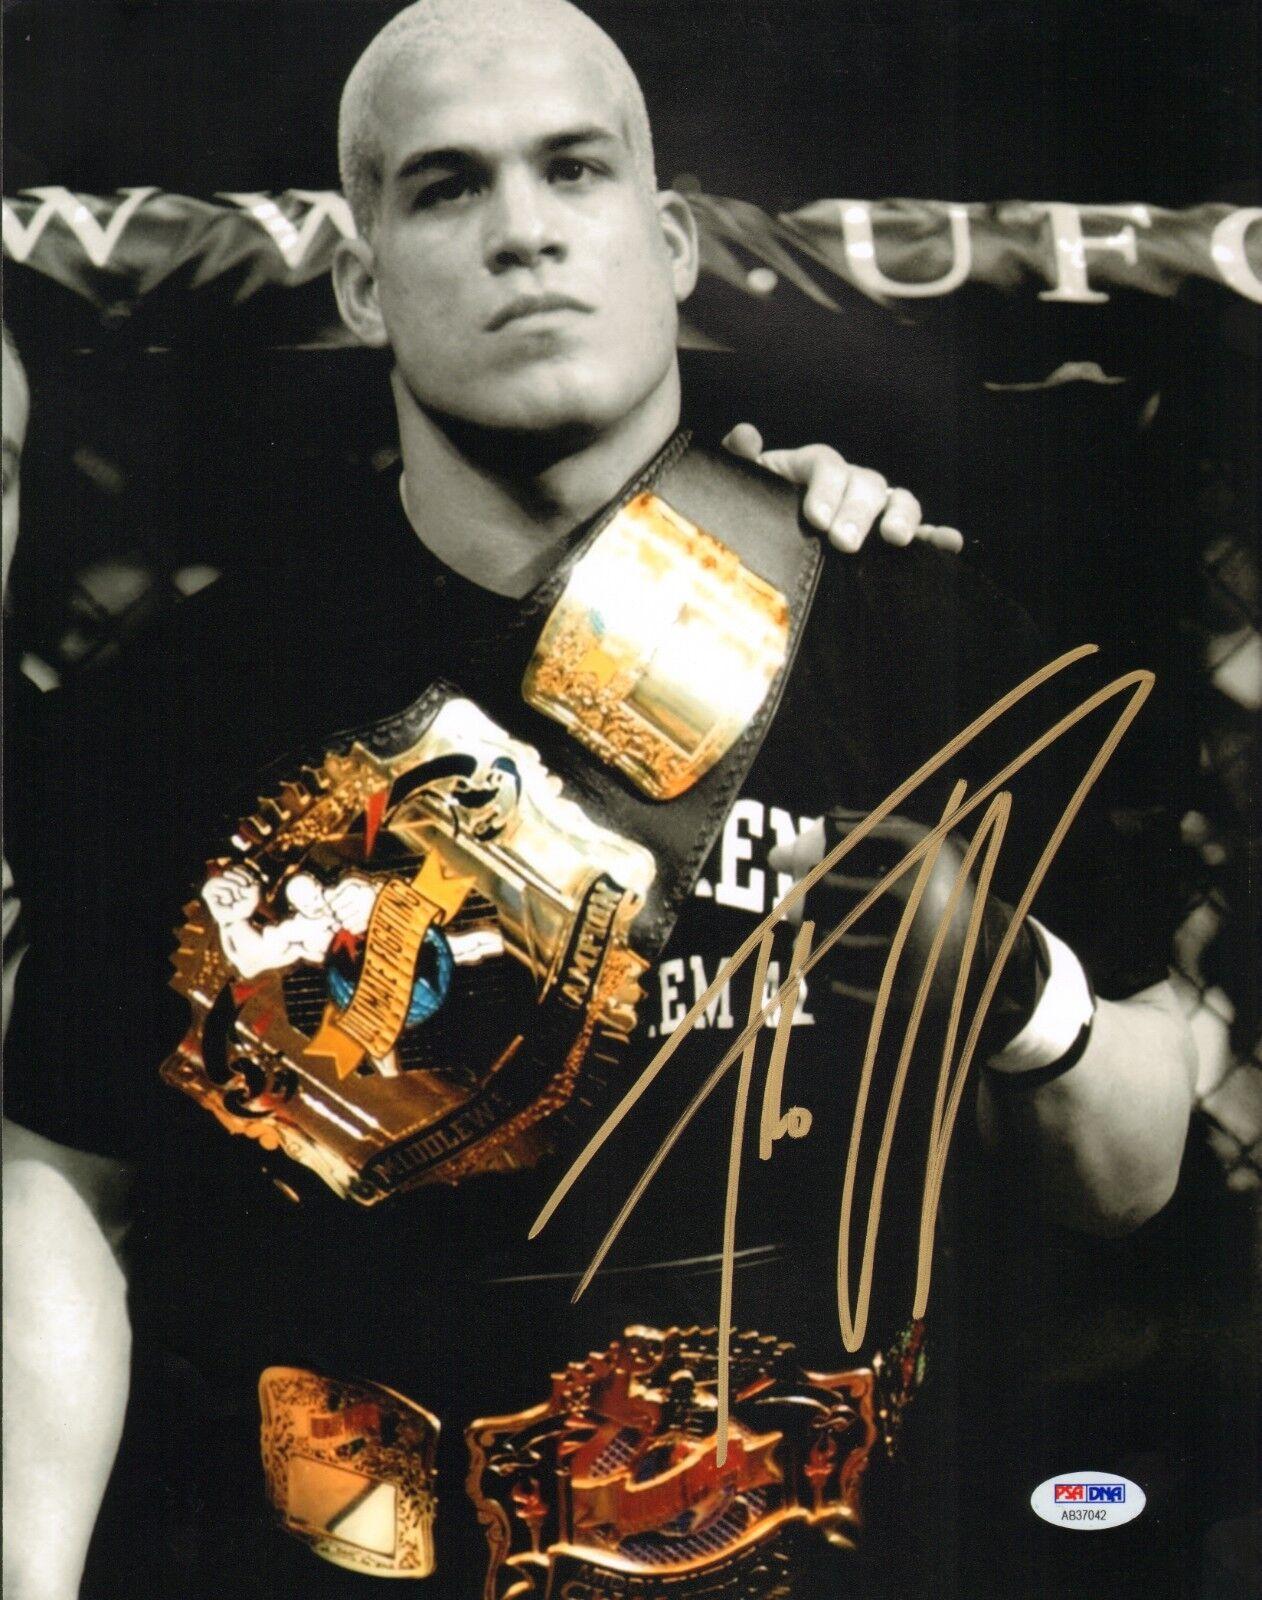 Tito Ortiz Firmado UFC 11x14 Foto PSA DNA COA Cinturón Autógrafo 25 30 40 32